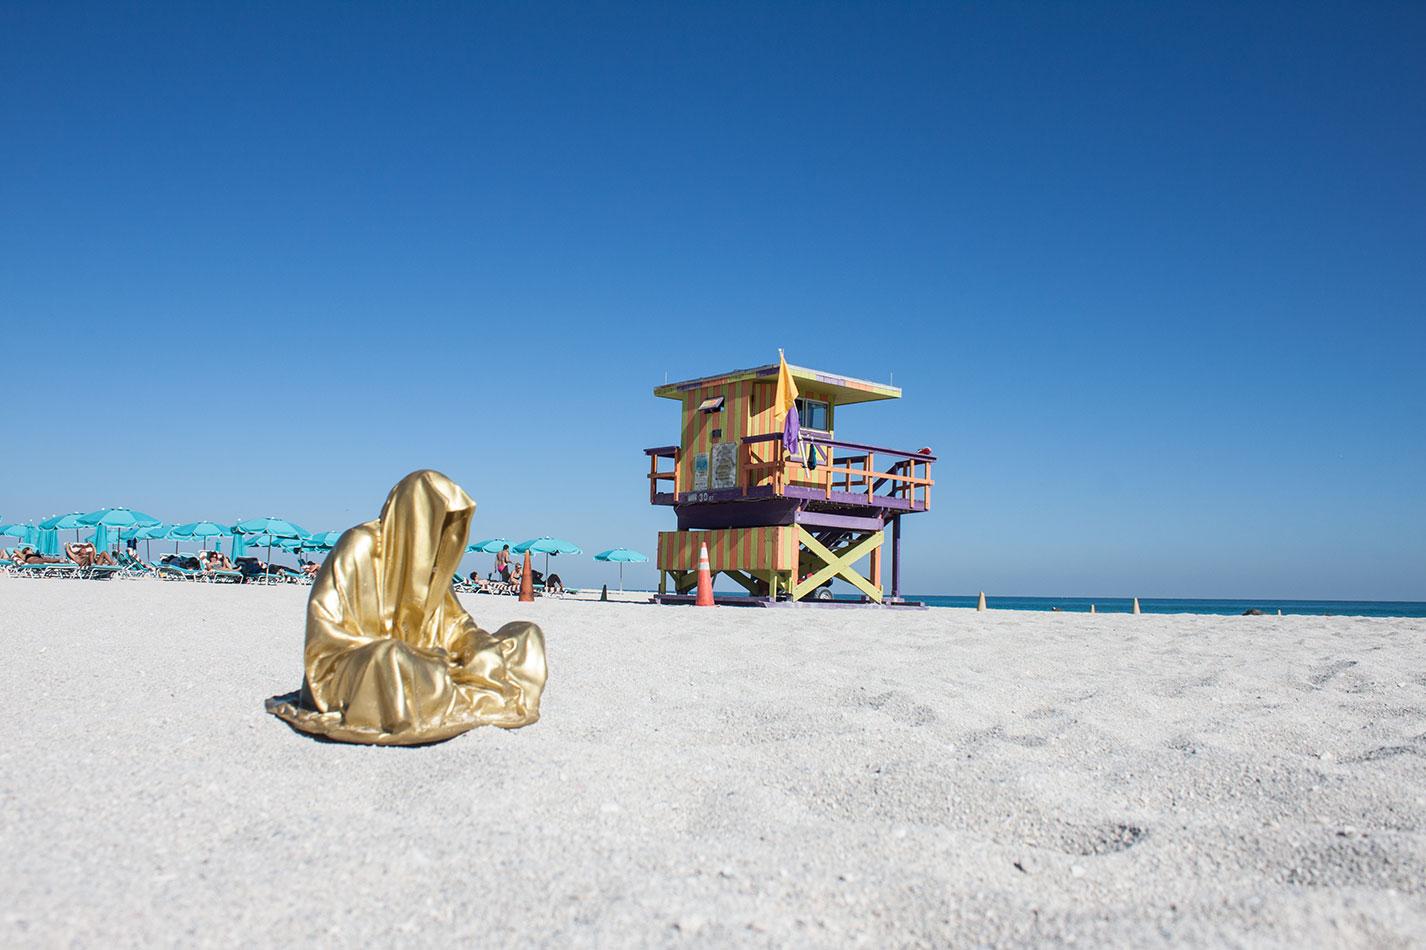 public-art-basel-miami-beach-fair-usa-florida-guardians-of-time-manfred-kili-kielnhofer-contemporary-fine-art-modern-arts-design-antiques-sculpture-7082